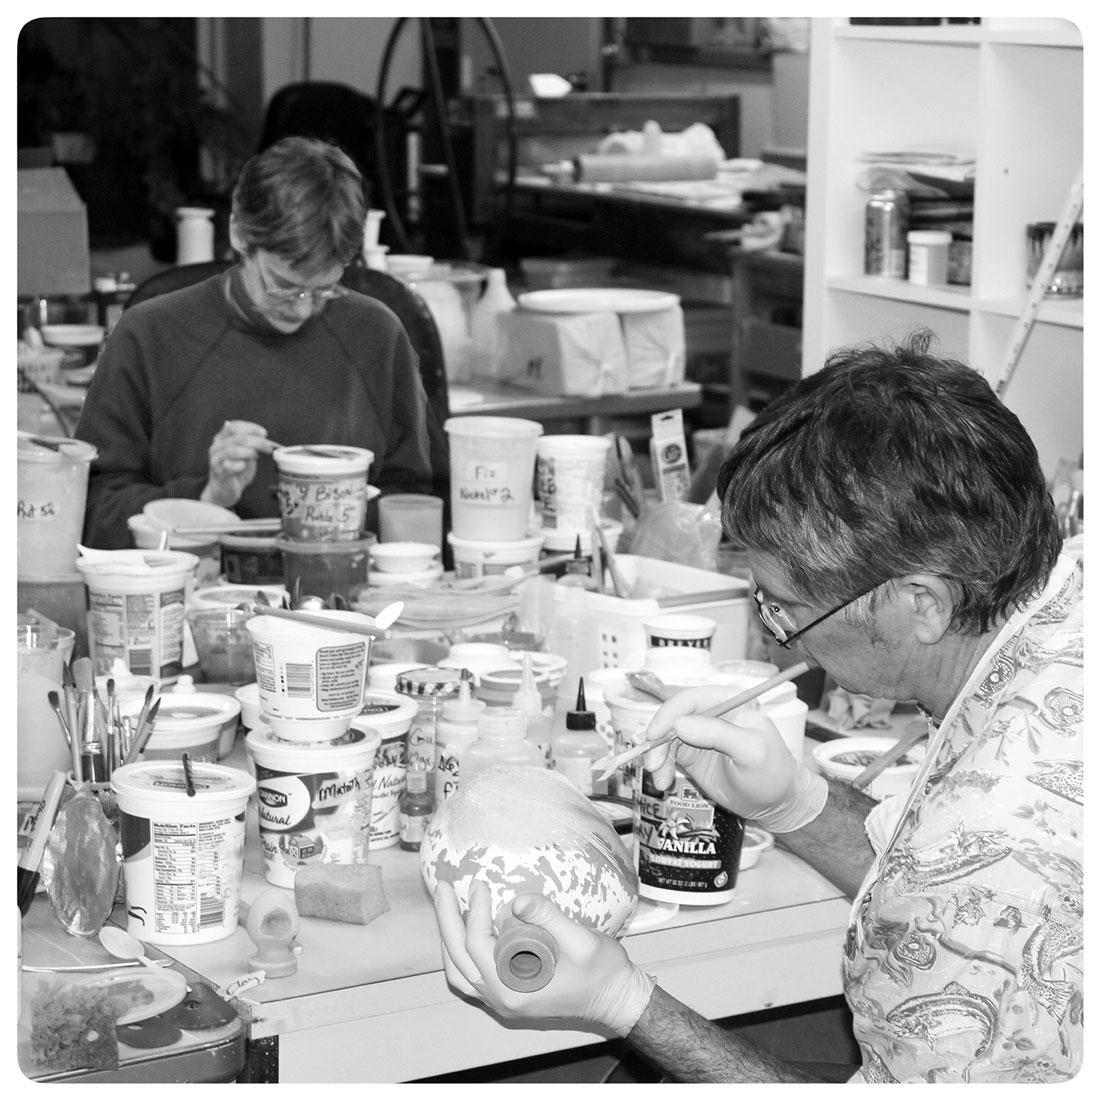 Bruce-Gholson-and-Samantha-Henneke-glazing-in-the-Pottery-Art-Studio.jpg